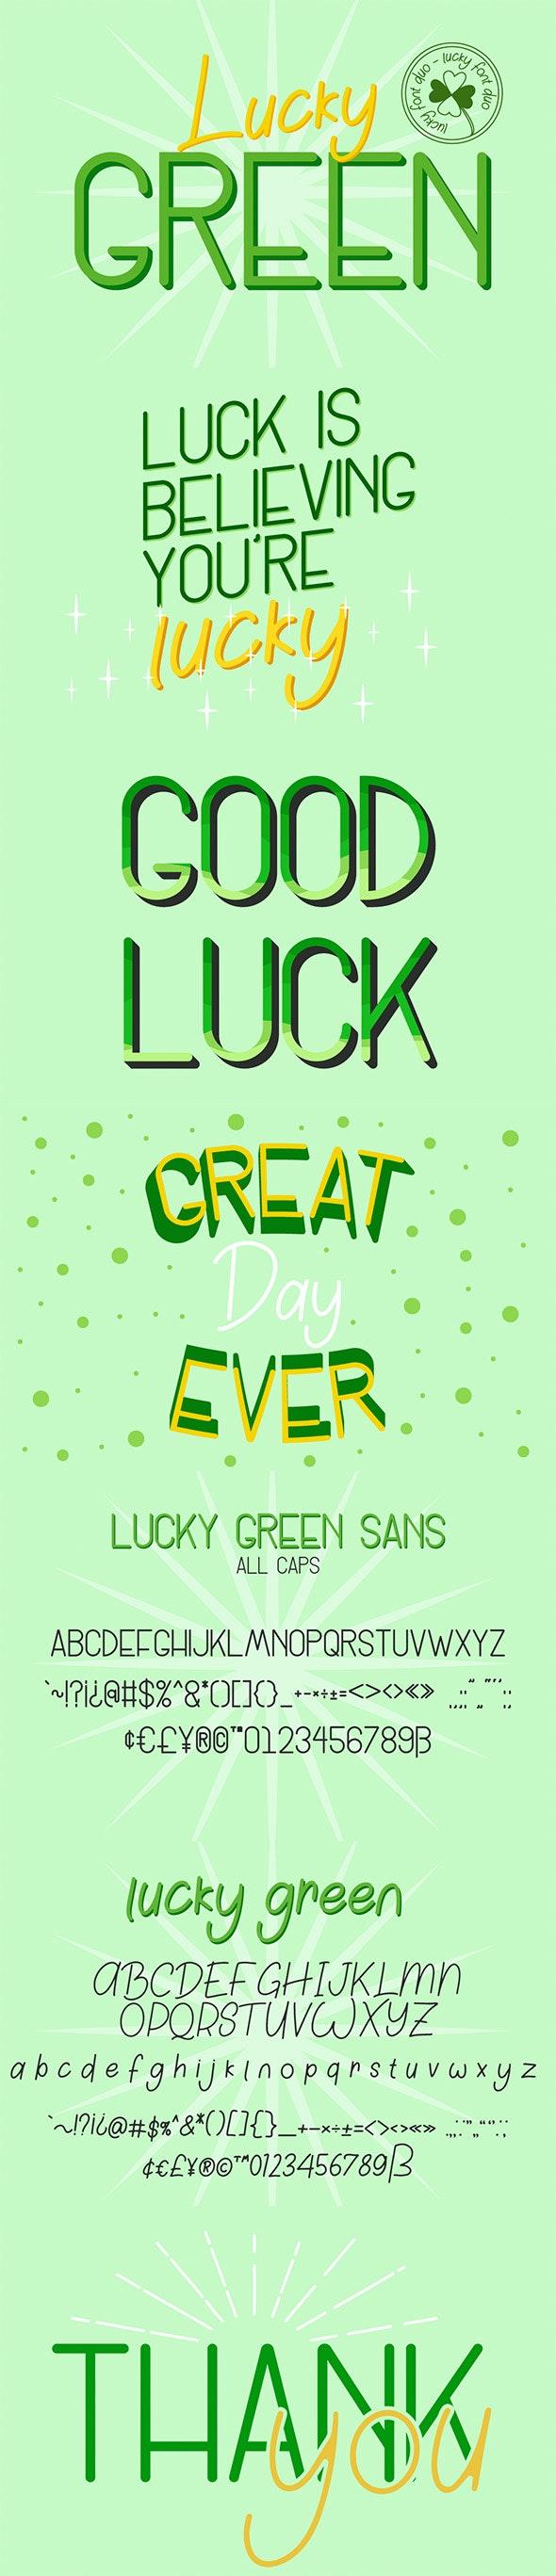 Lucky Green Font Duo - Hand-writing Script